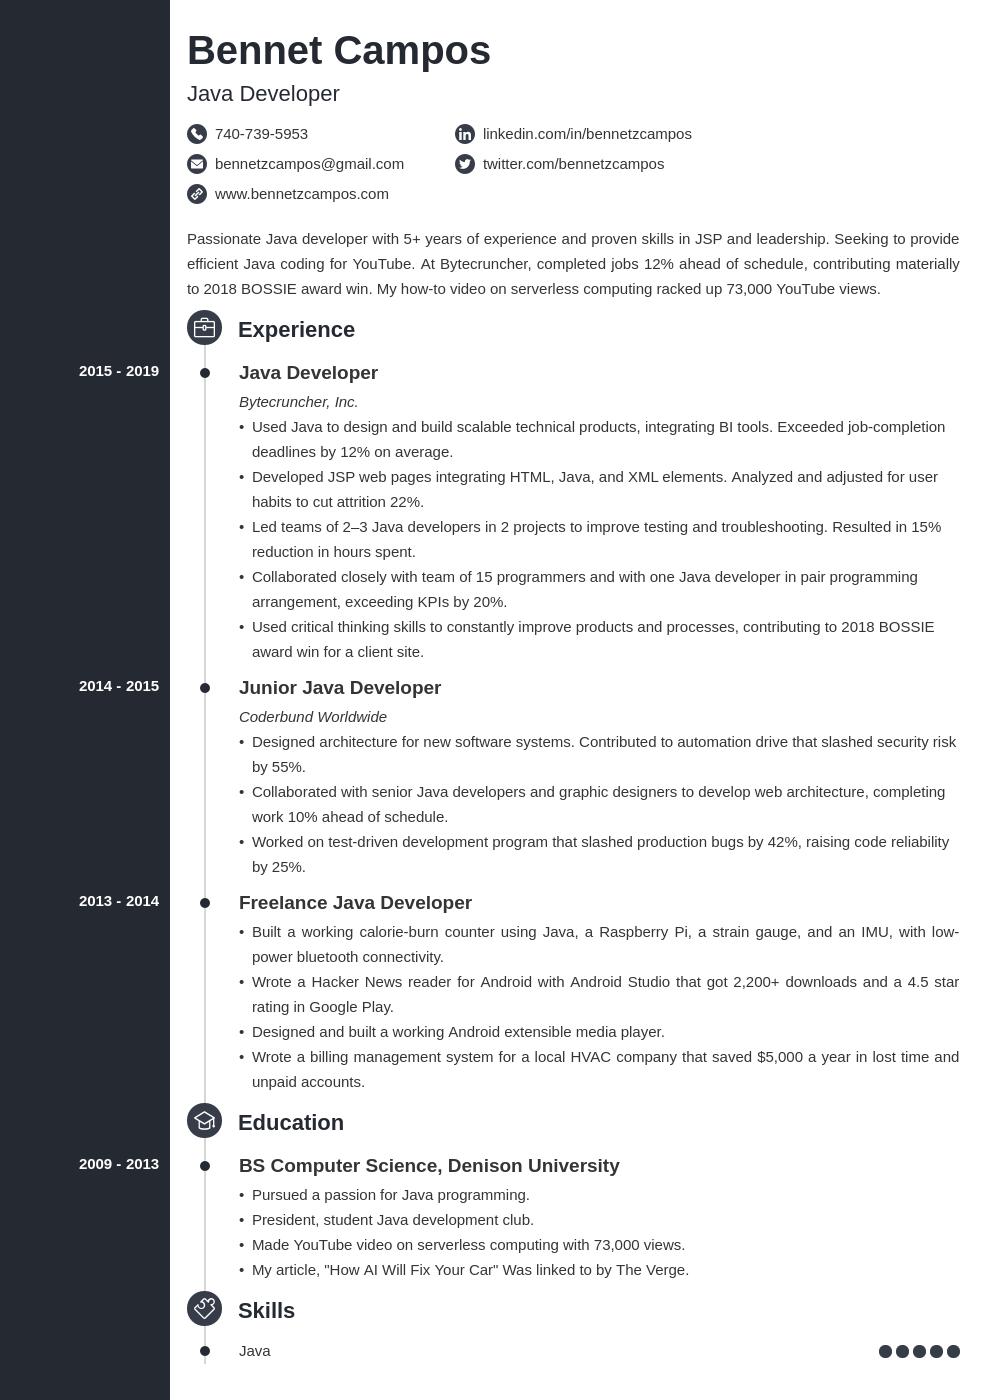 java developer template concept